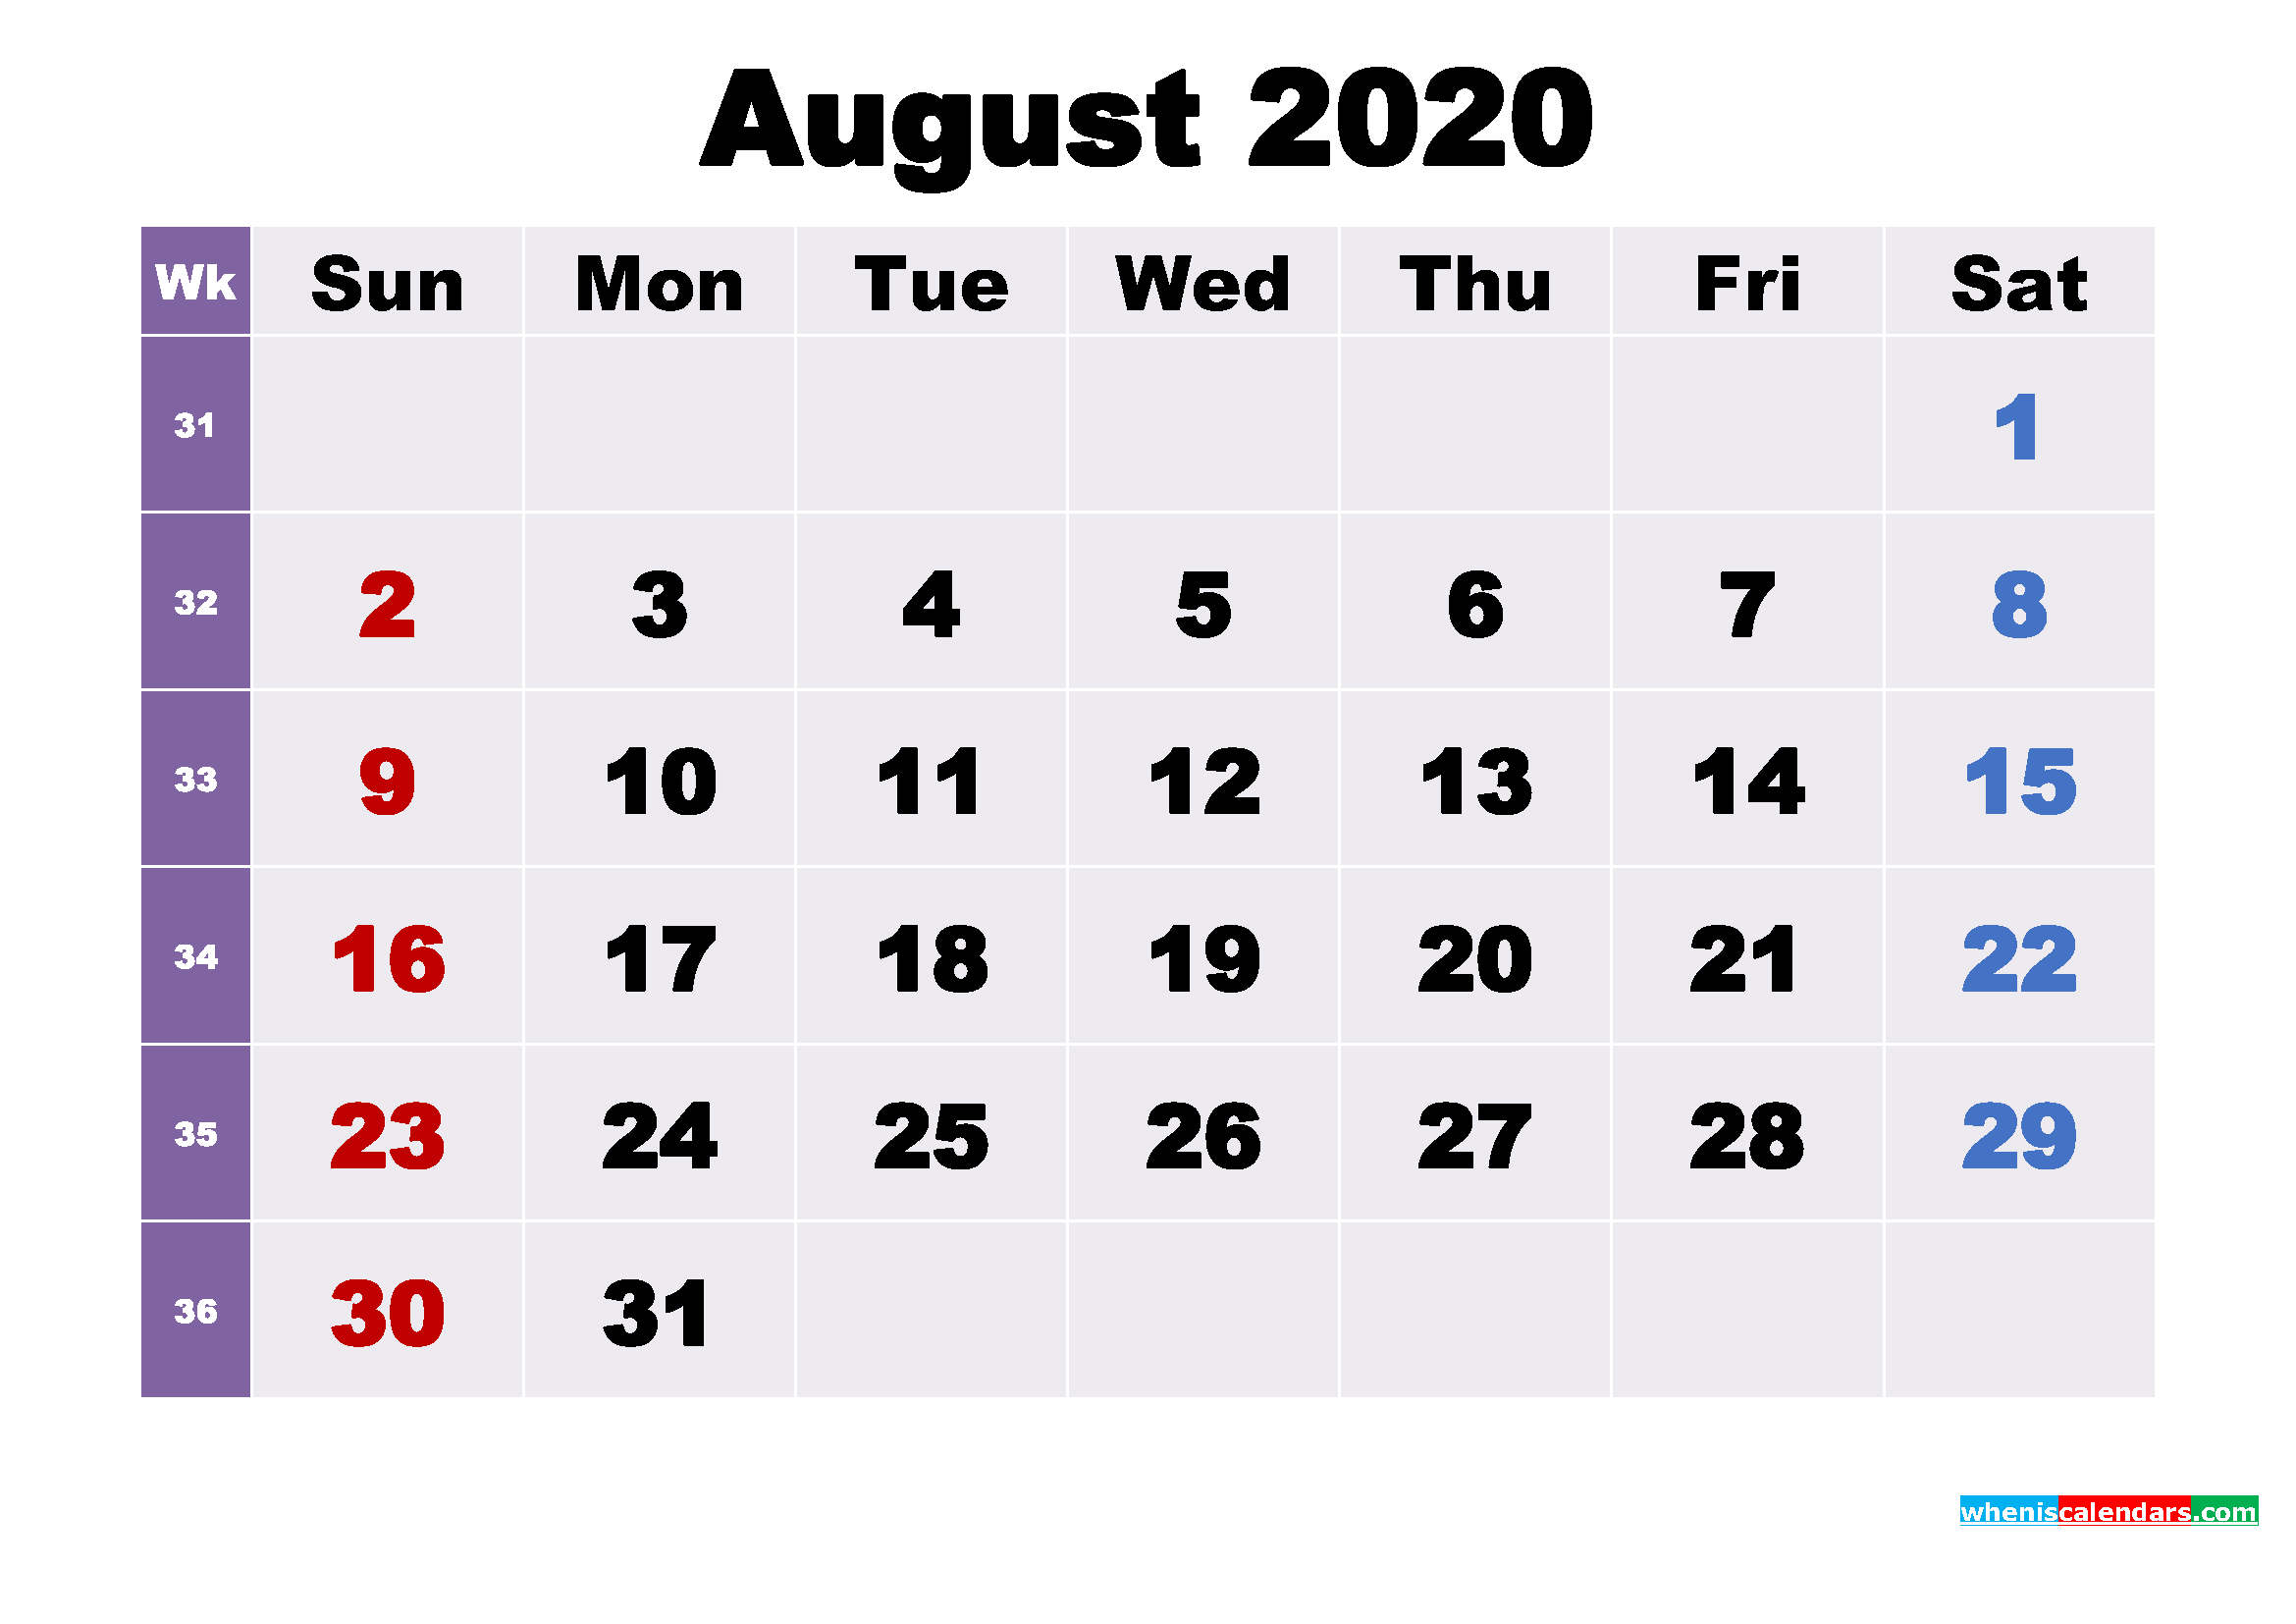 August 2020 Calendar with Holidays Wallpaper